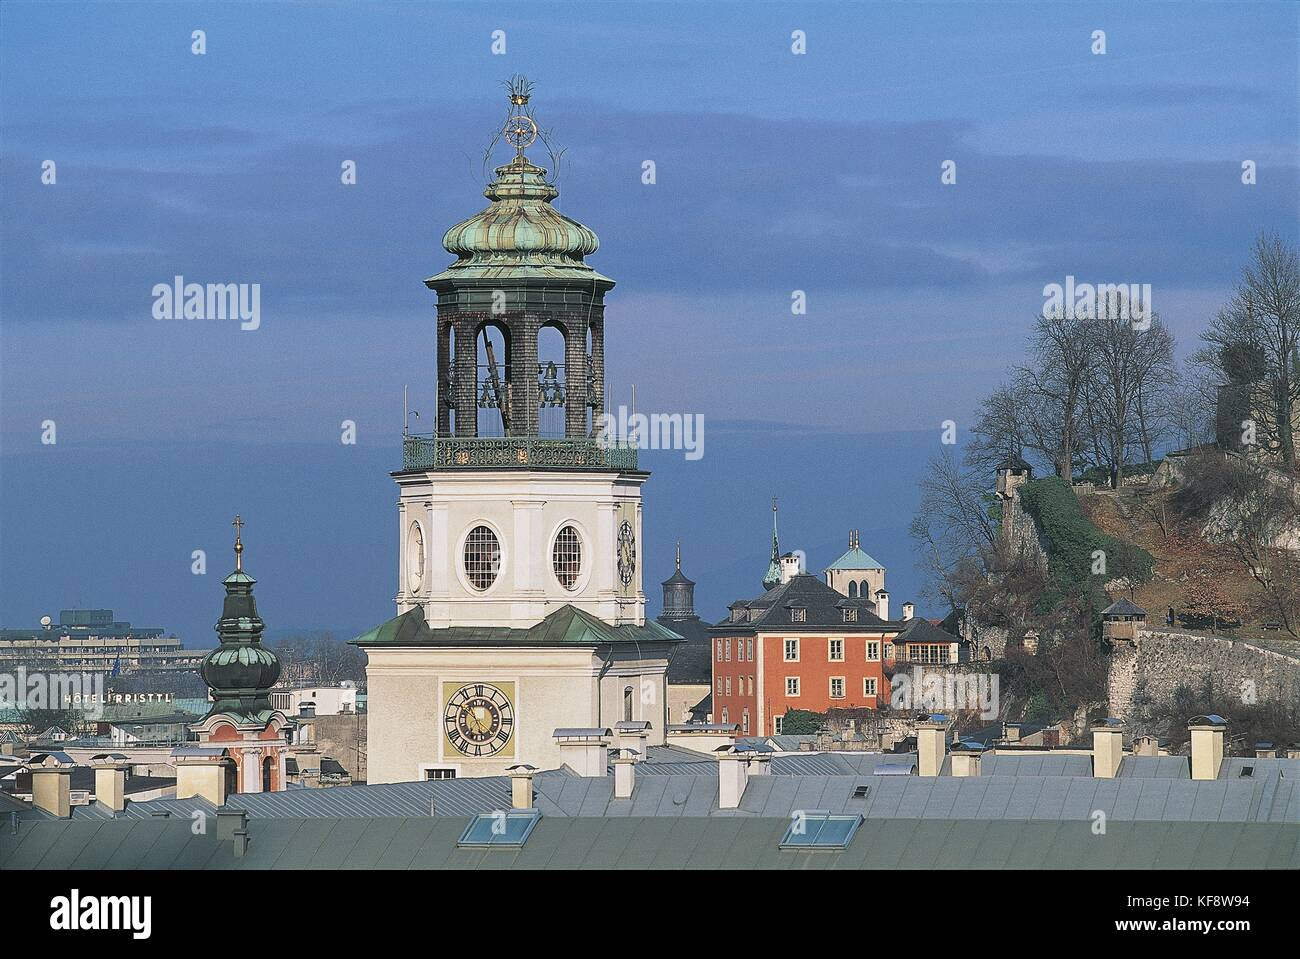 Austria, Salzburg (UNESCO's World Heritage Site, 1996). Salzburger Glockenspiel. Carillon bells Stock Photo